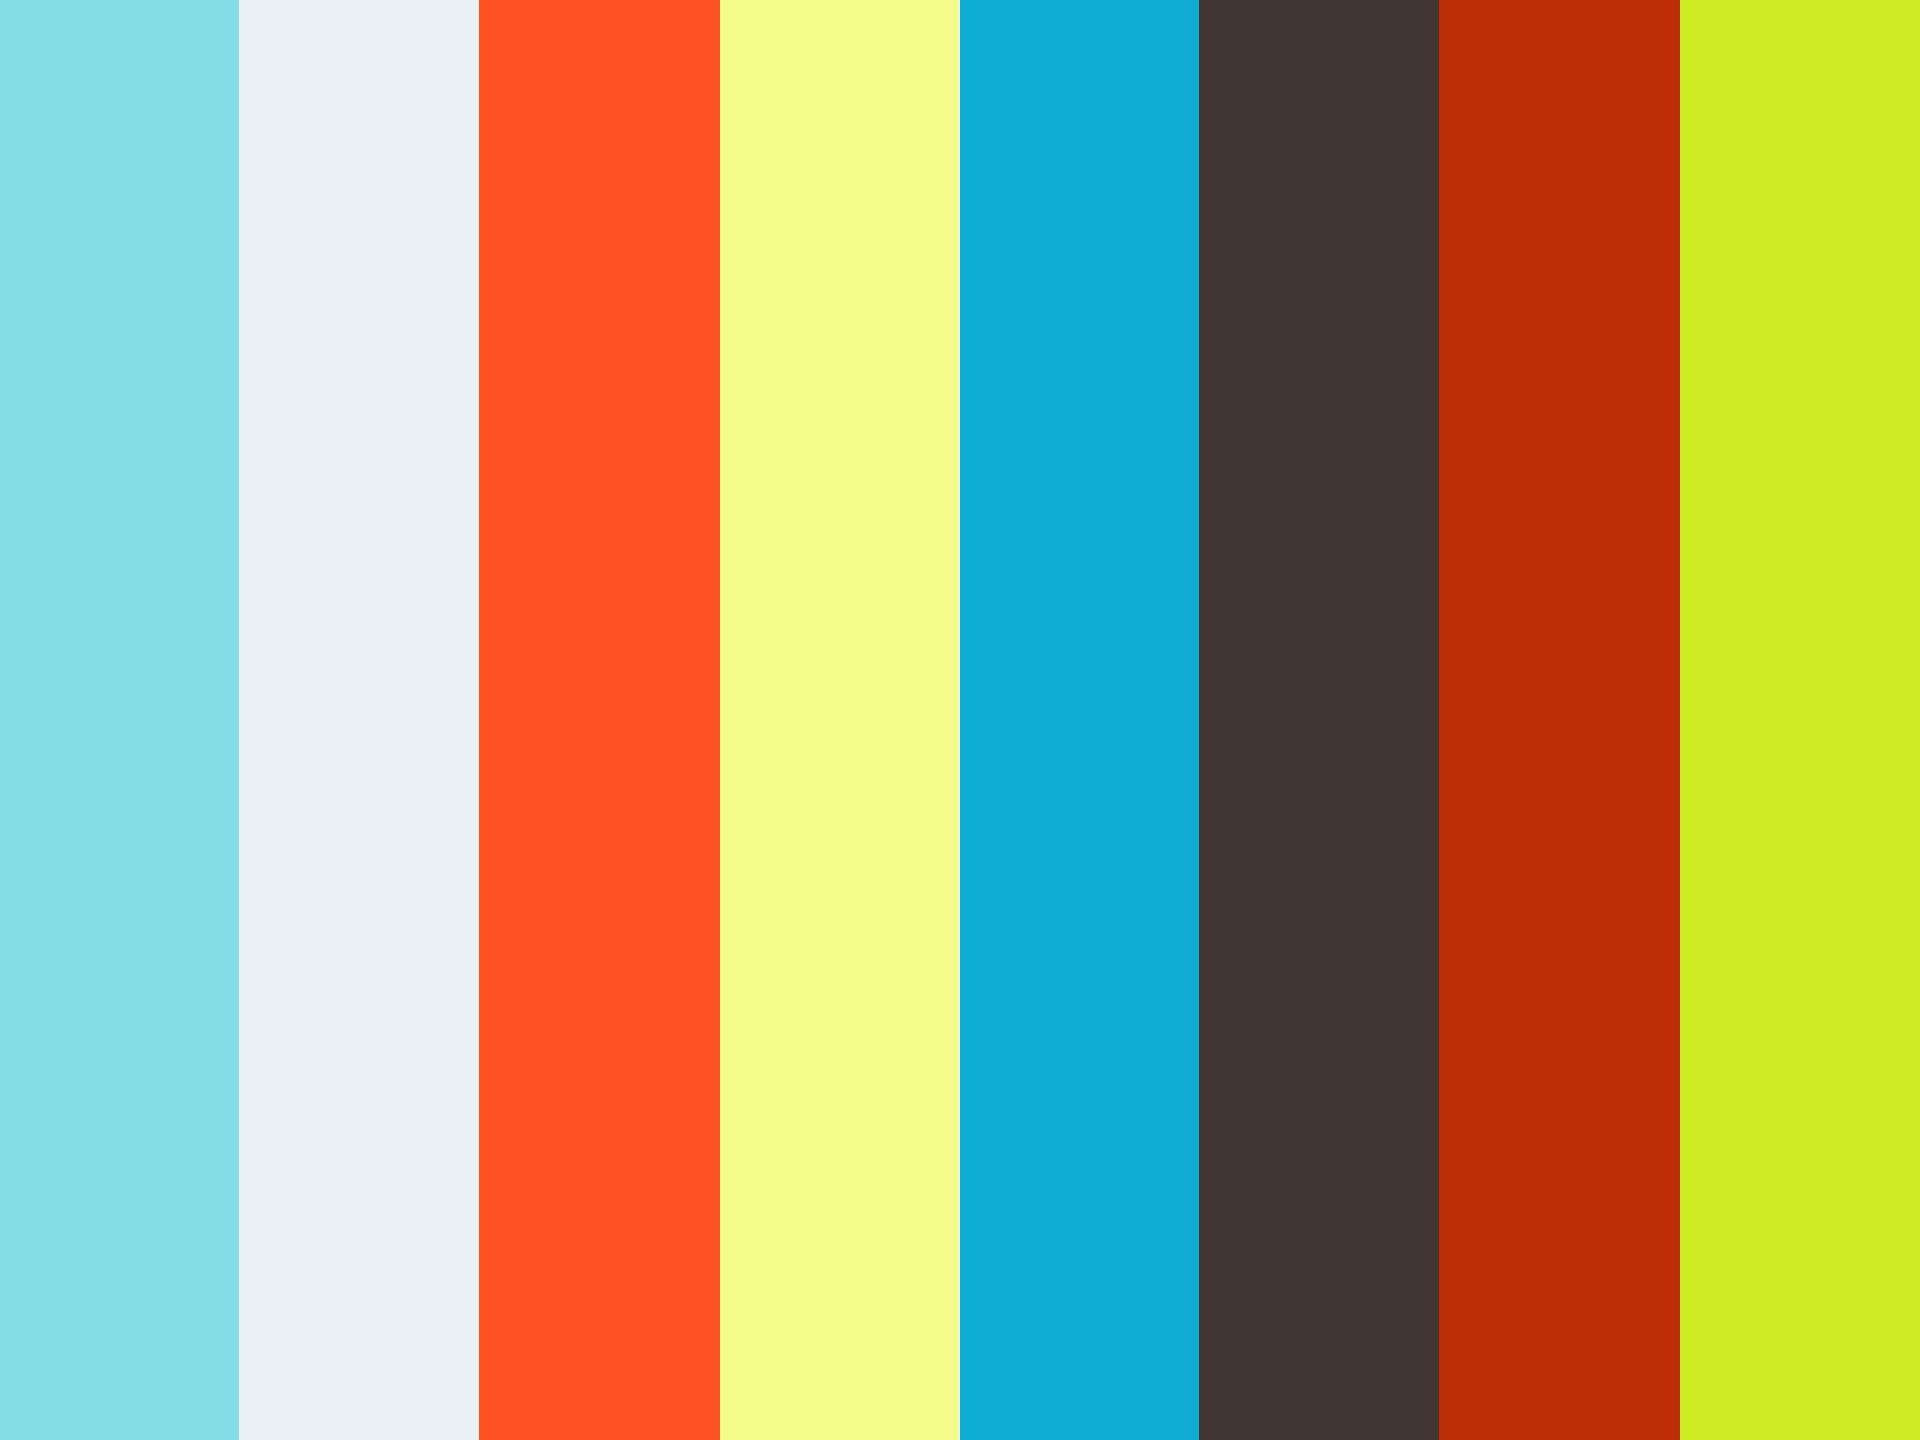 MERCEDES BENZ CLA 45 - BLACK - 2016